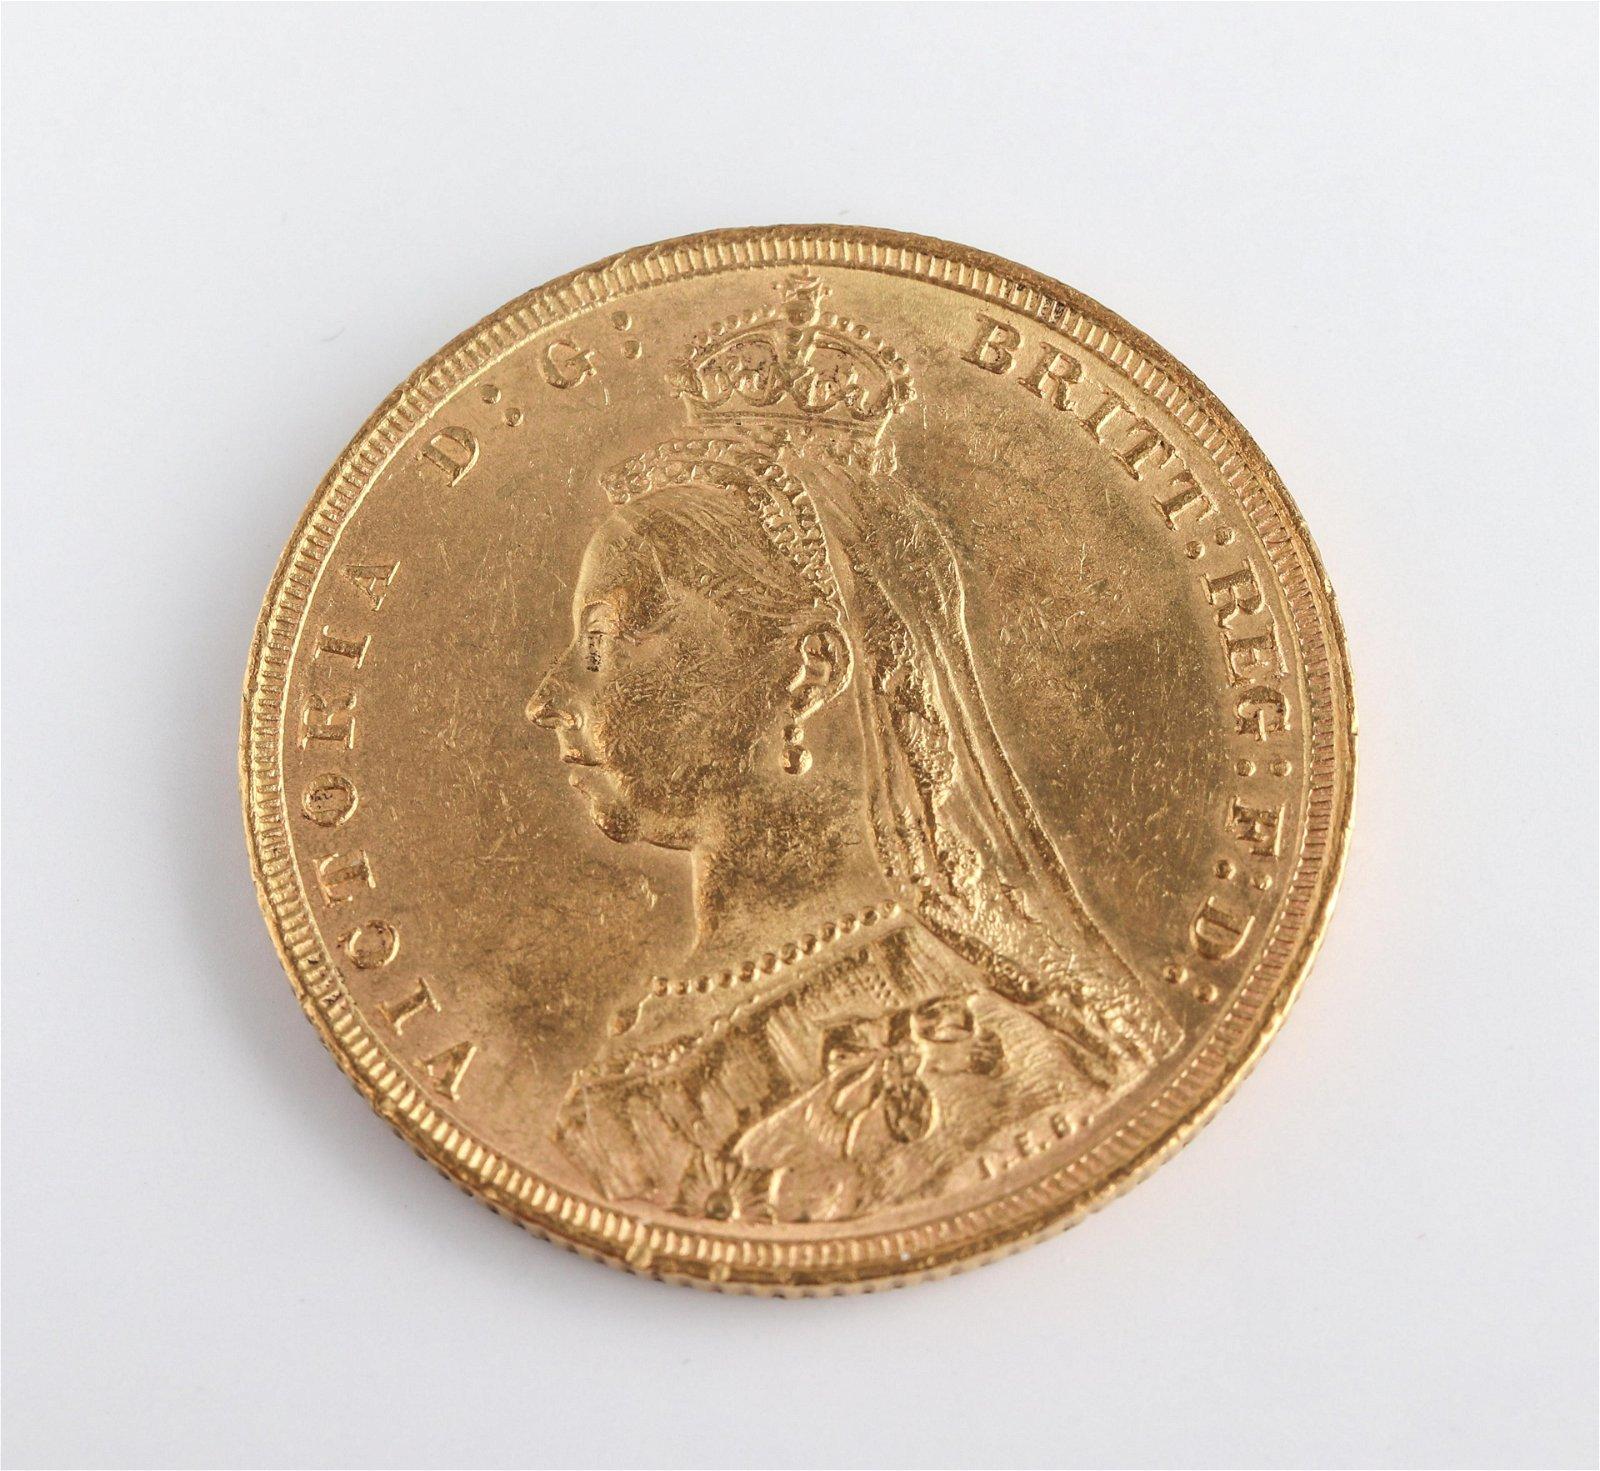 1890 S Australia Victoria Sovereign Gold Coin